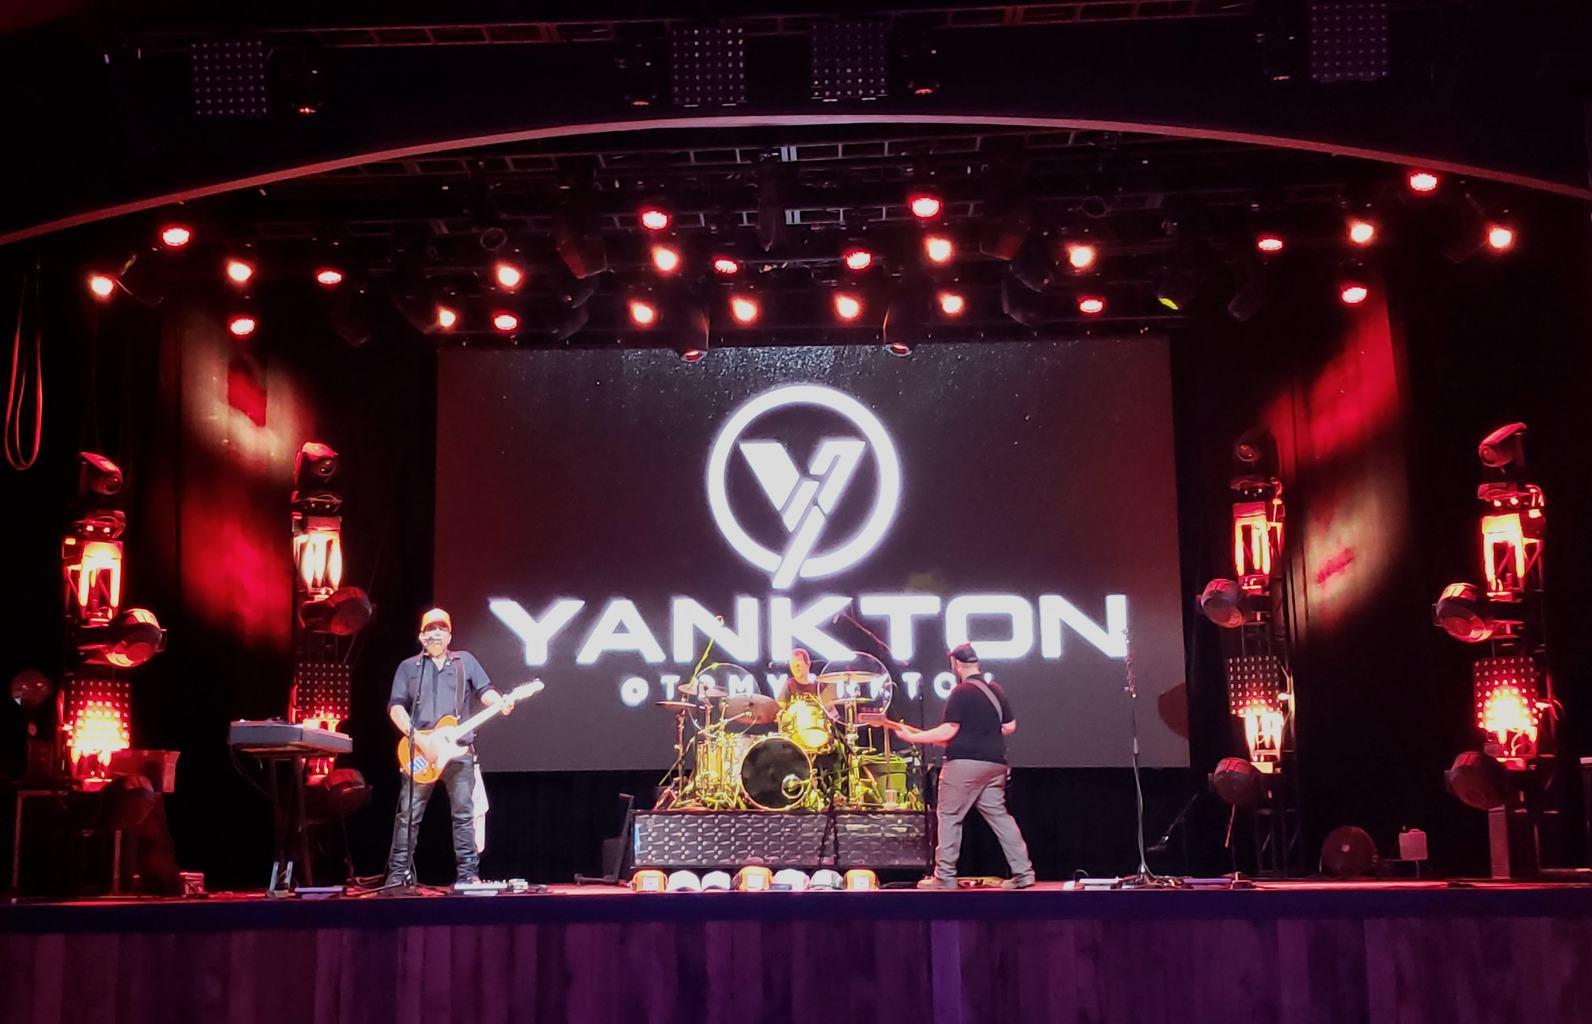 tom yankton band, wildhorse saloon band schedule